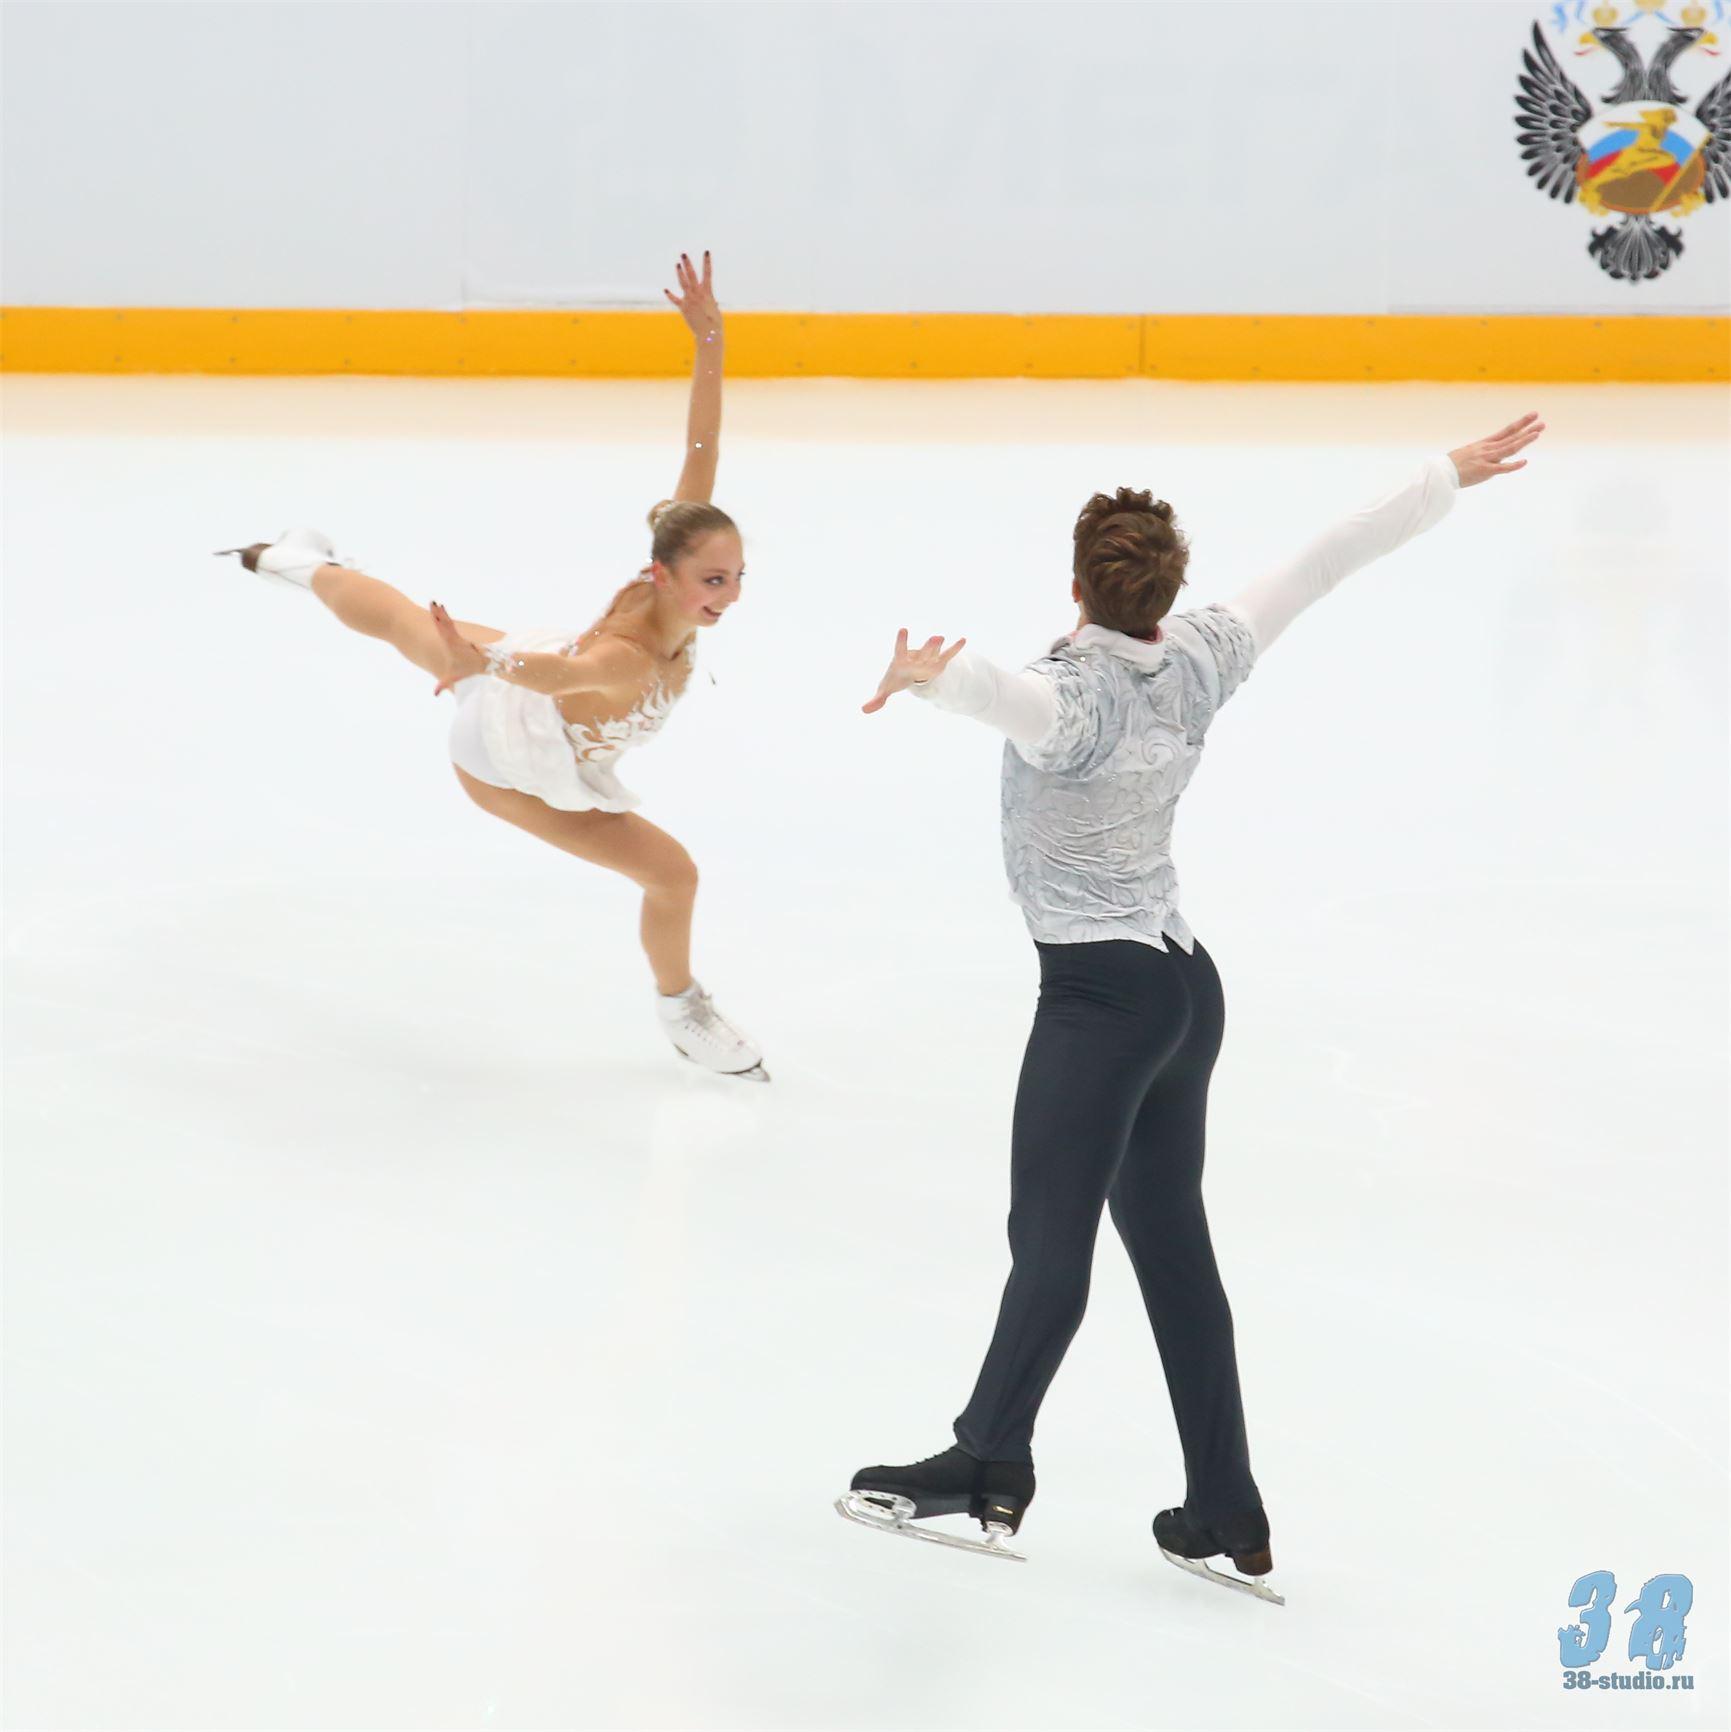 Александра Бойкова-Дмитрий Козловский - Страница 12 GAAGDcHSzXw